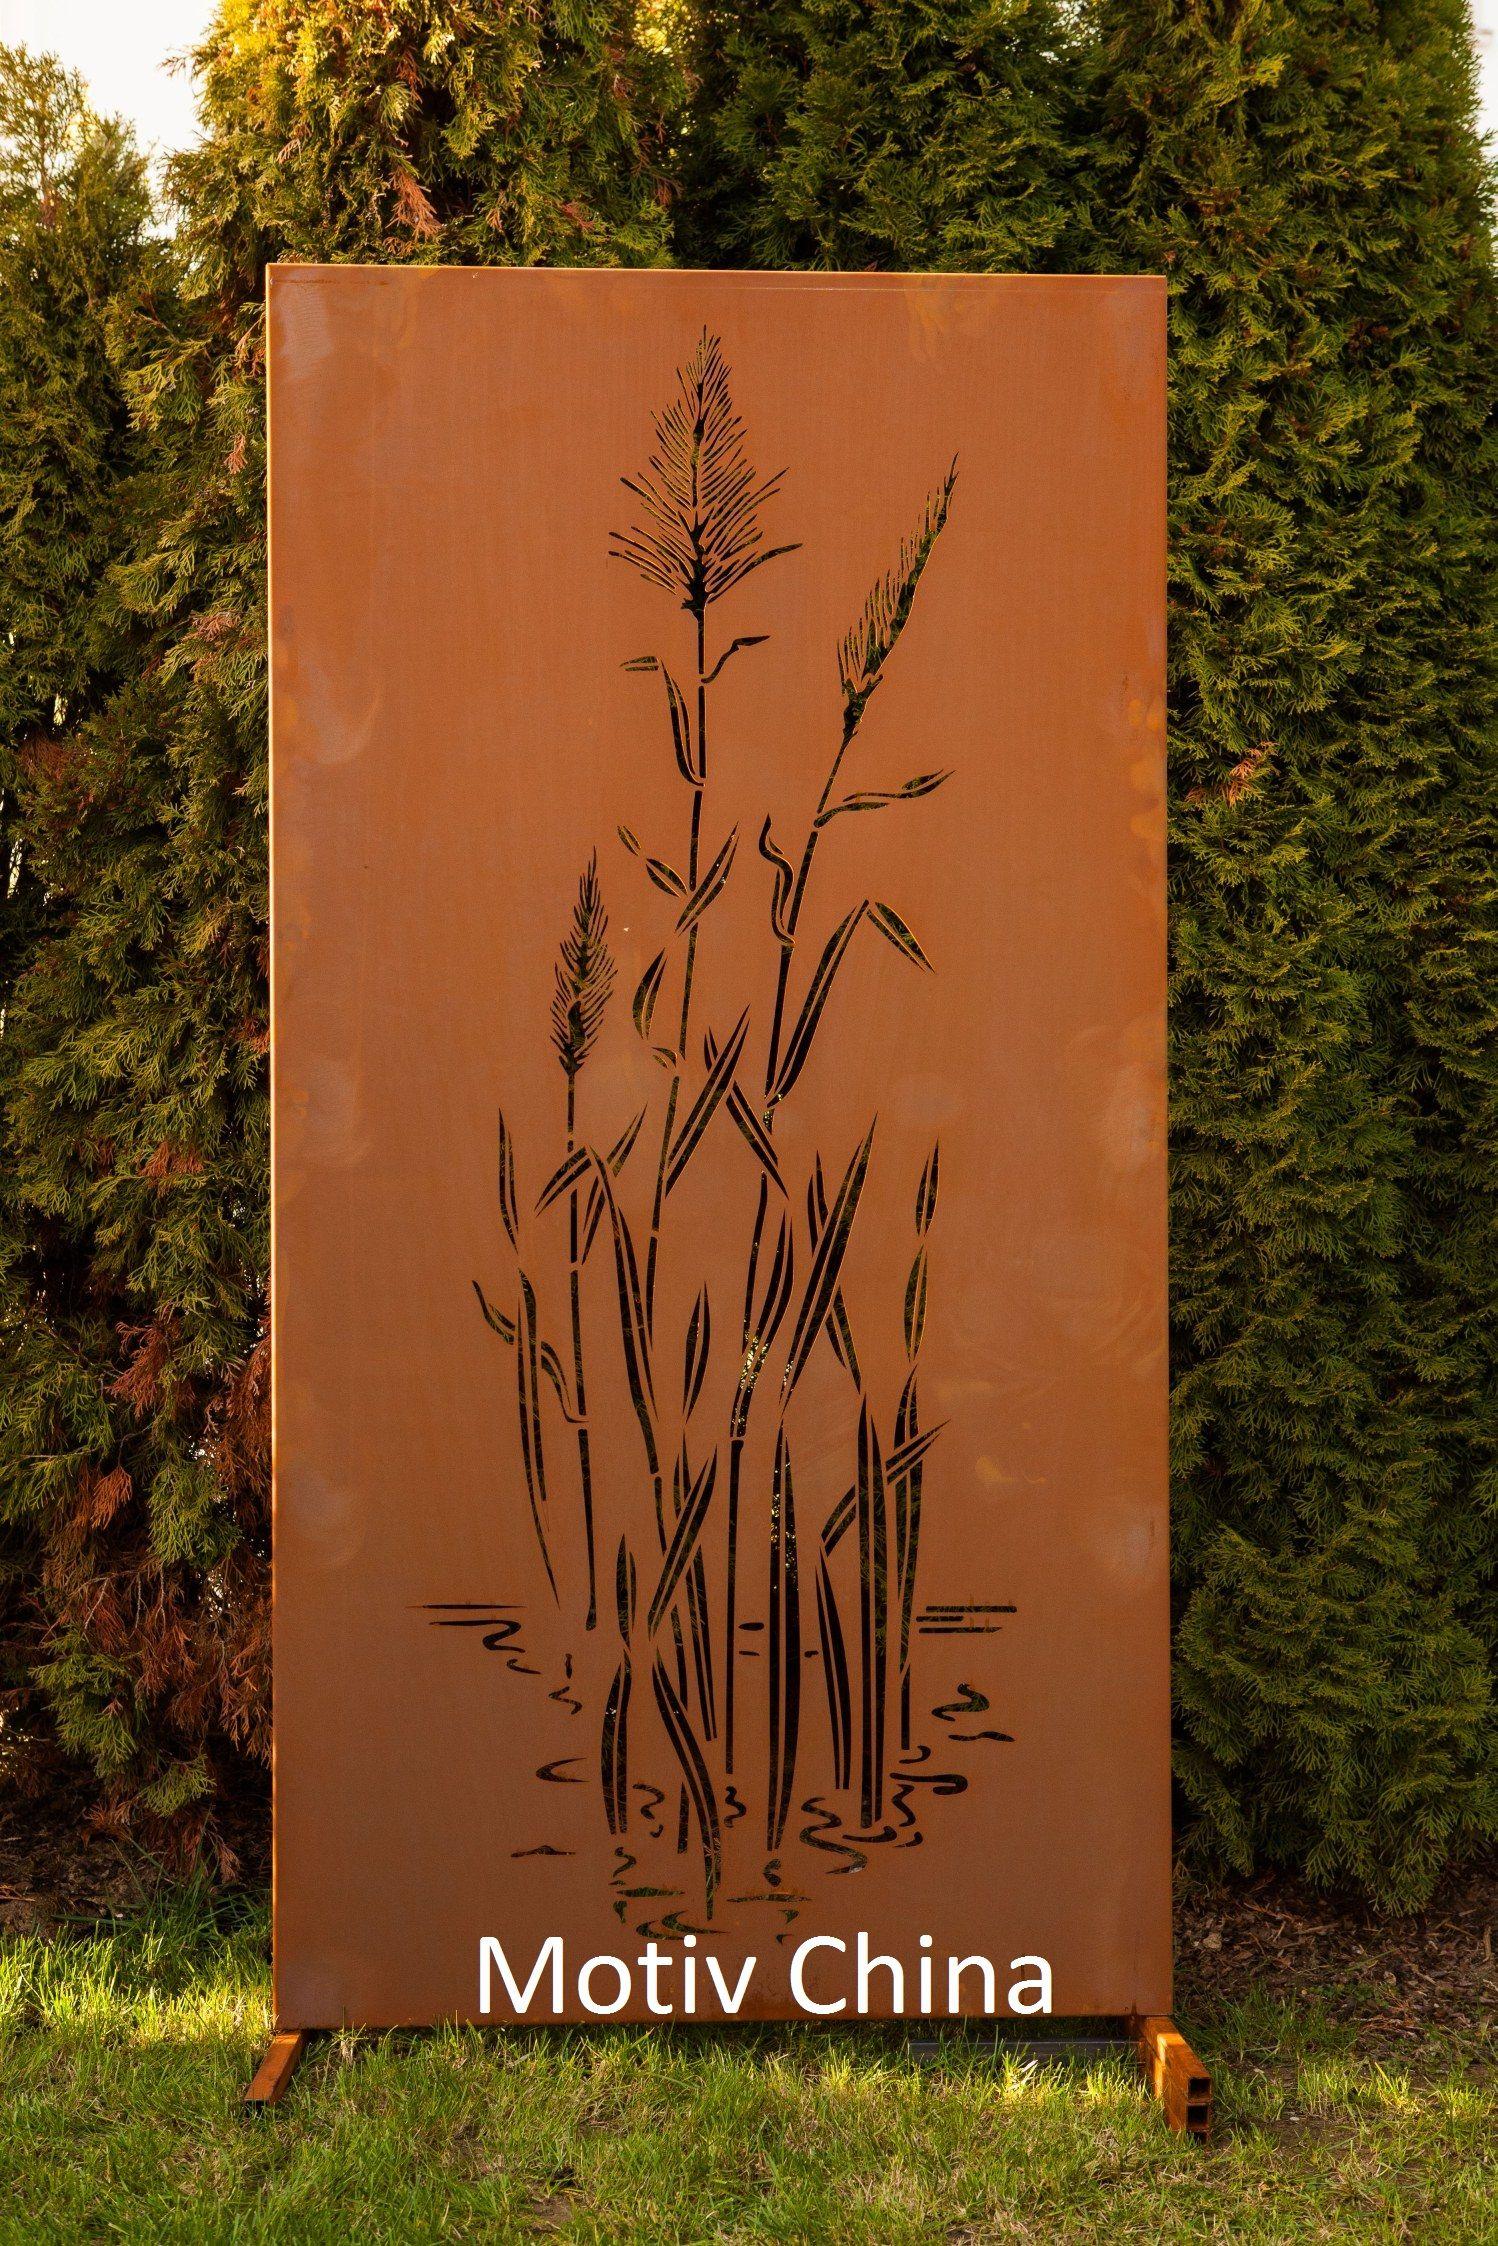 Garten Im Quadrat 3er Set Moderne Sichtschutz Wand Aus Metall